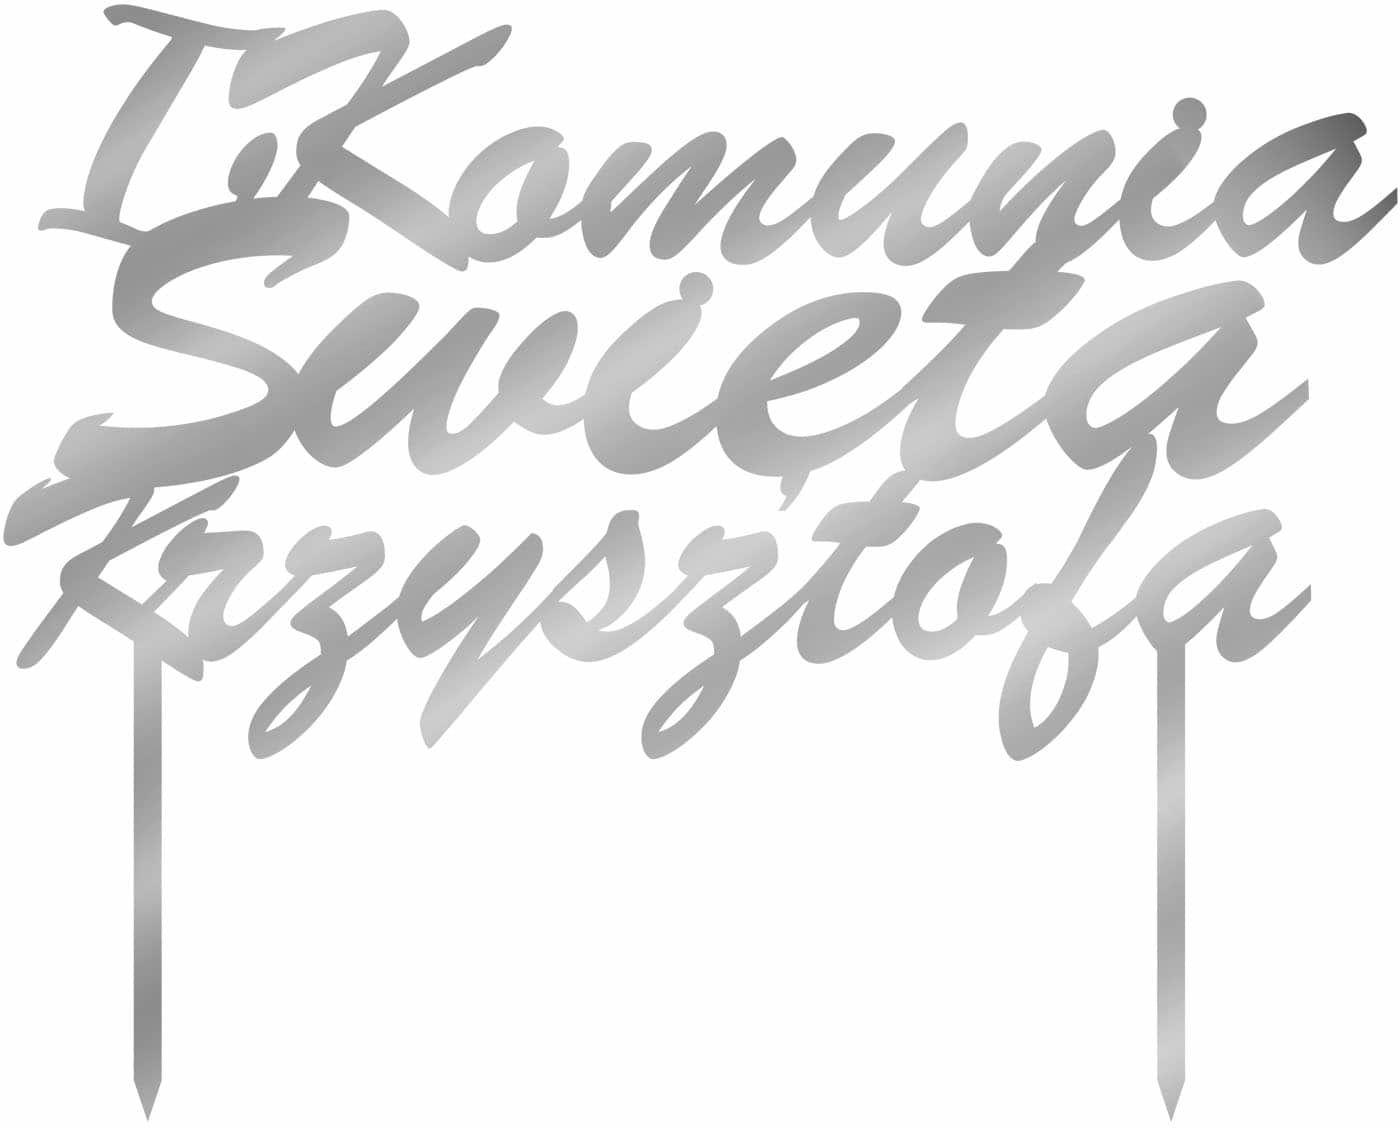 Topper z lustrzanej pleksi srebrny personalizowany na tort I Komunia Święta